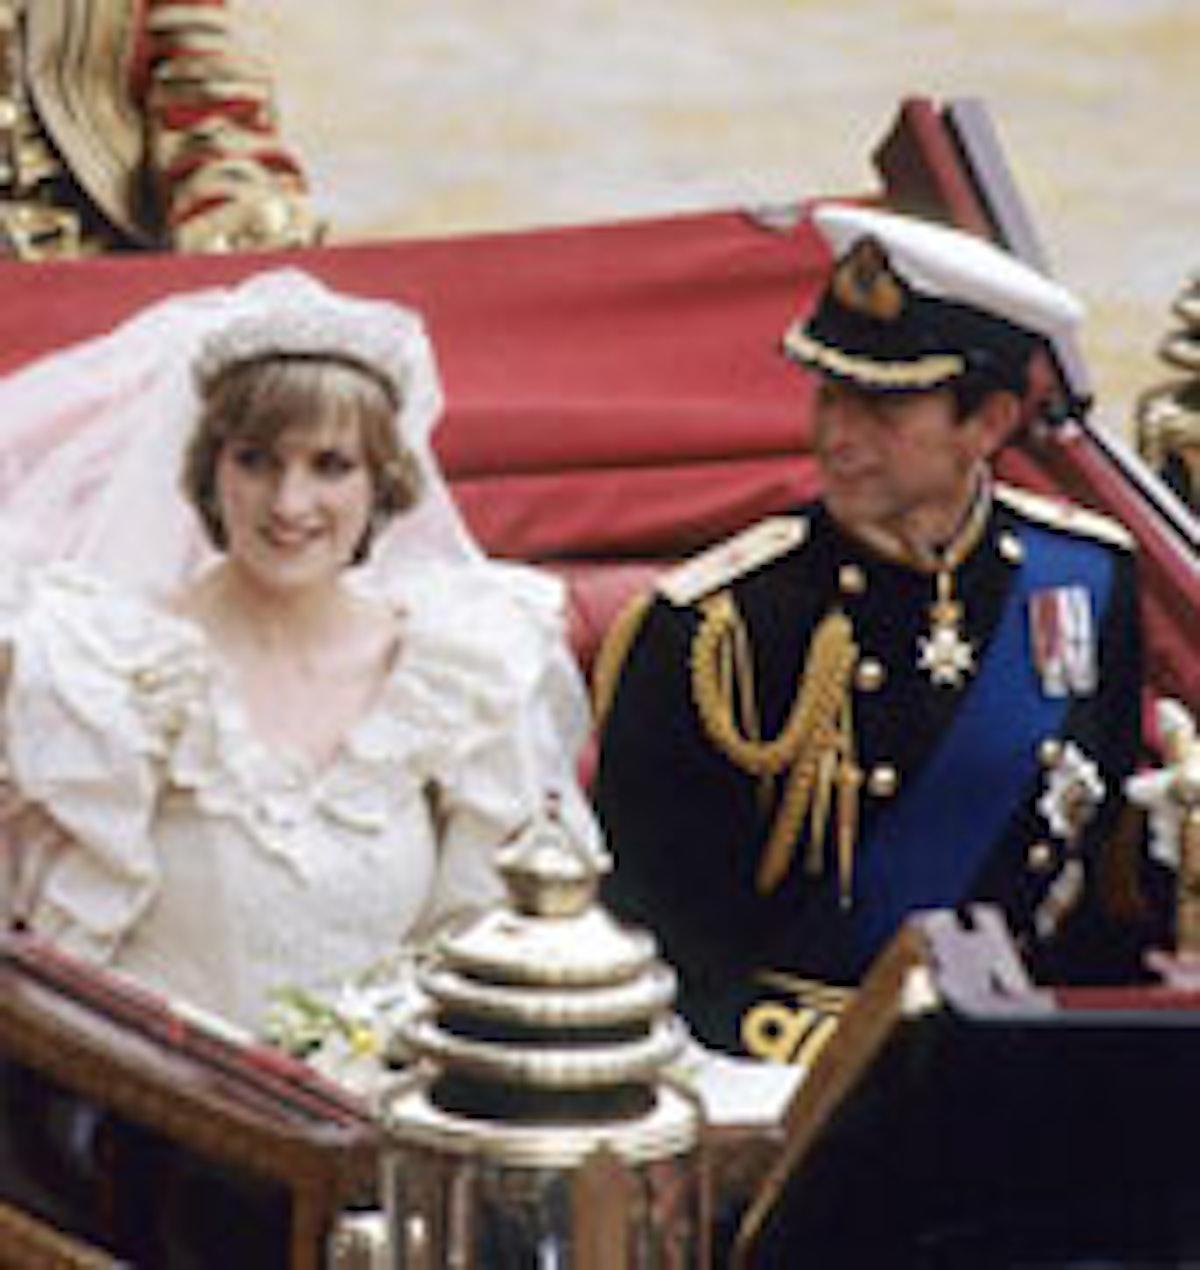 soss-royal-wedding-fashion-search1.jpg